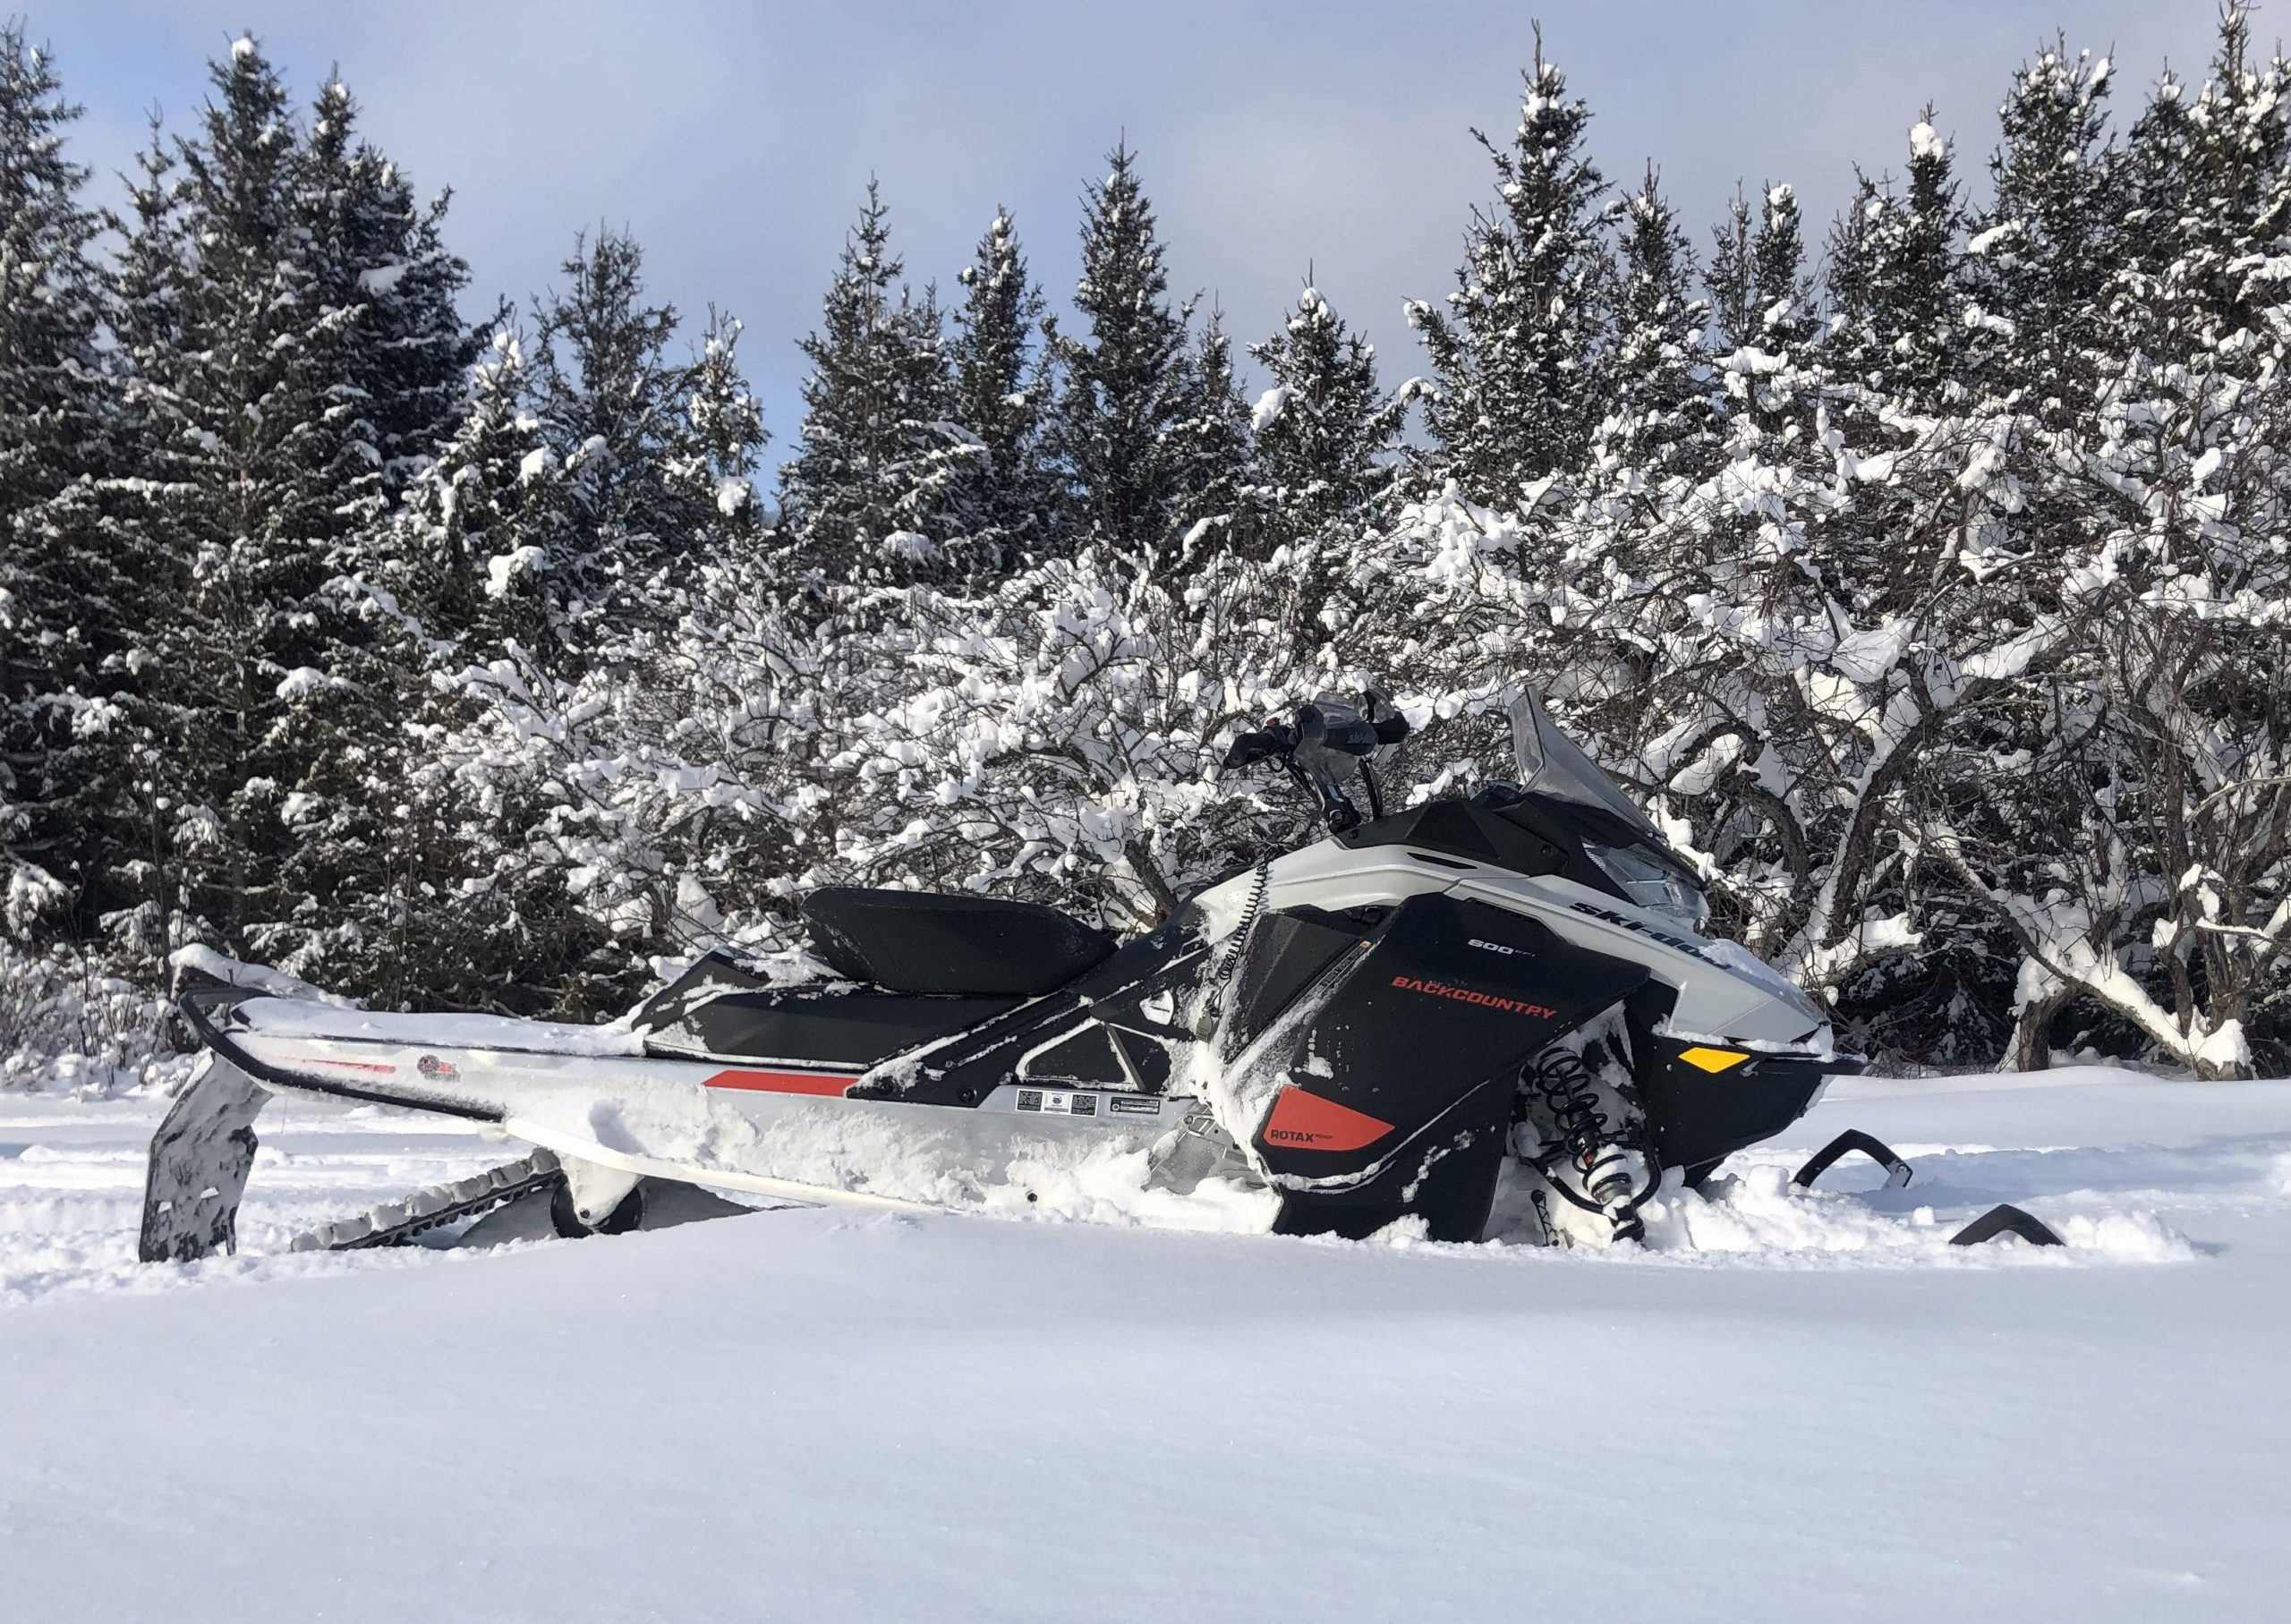 Bilan d'essai de la Ski-Doo Backcountry Sport 600 EFI 2021